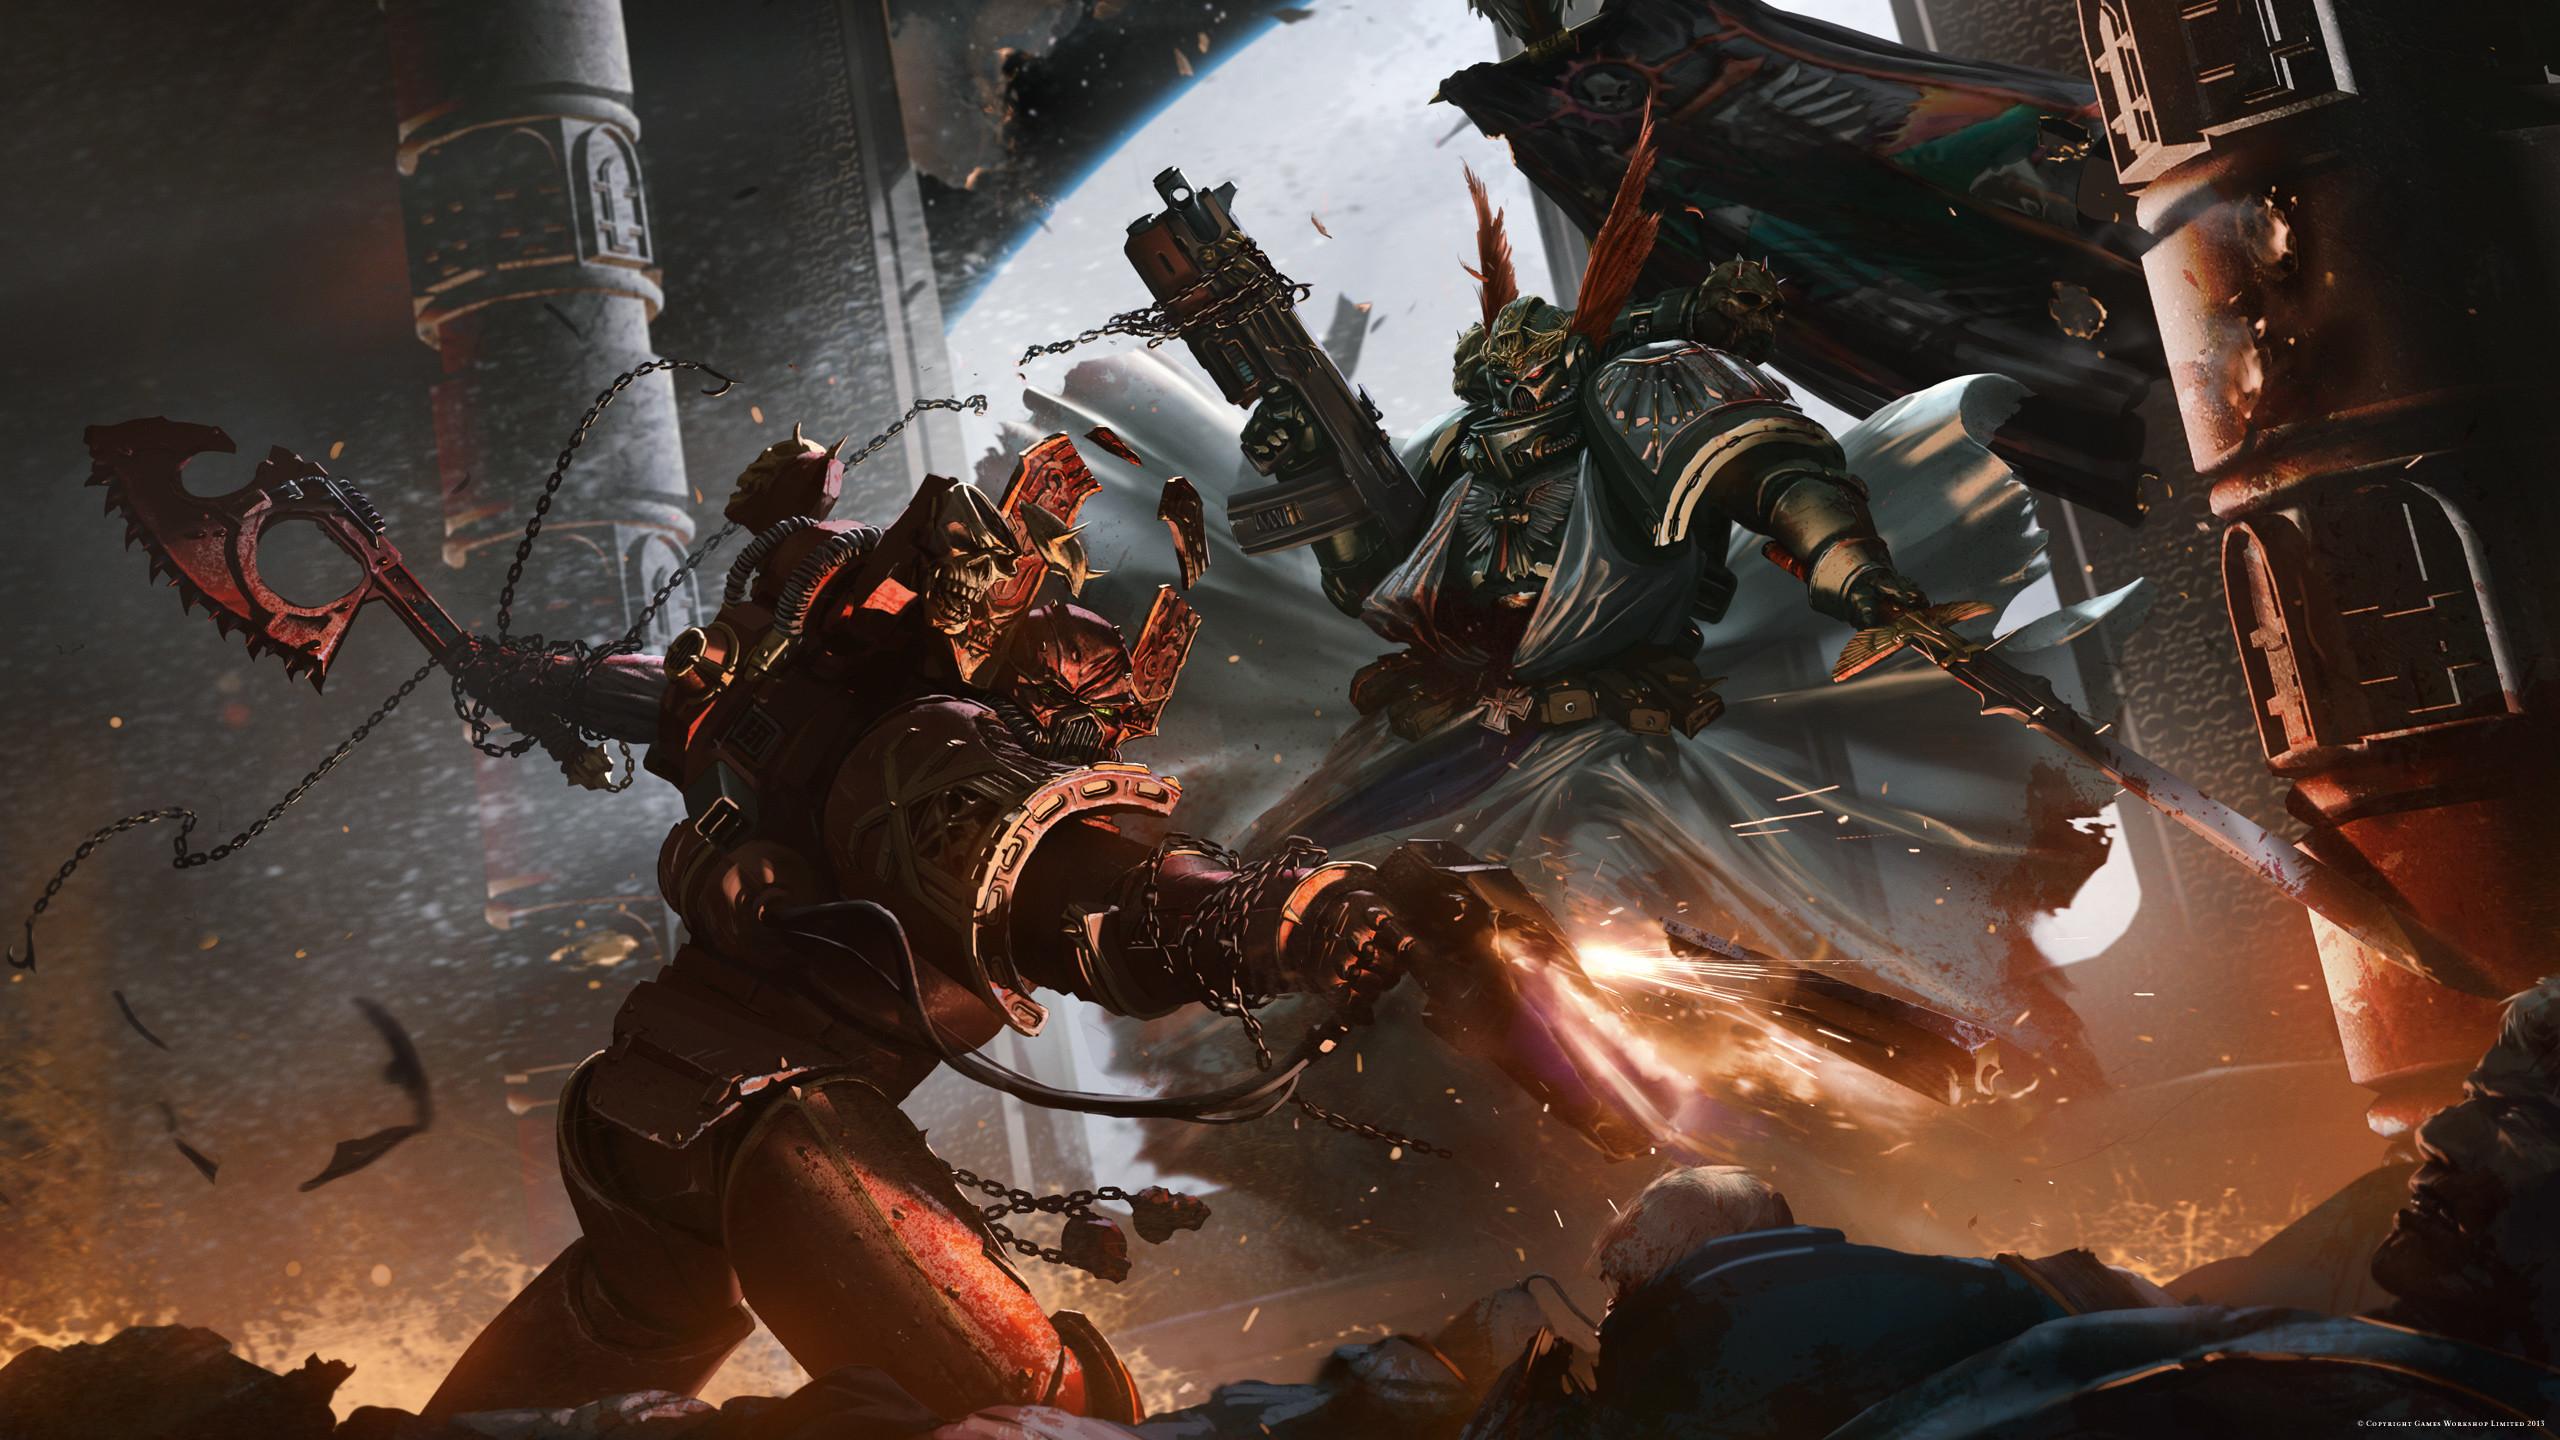 Warhammer 40K Res: / Size:1272kb. Views: 6843